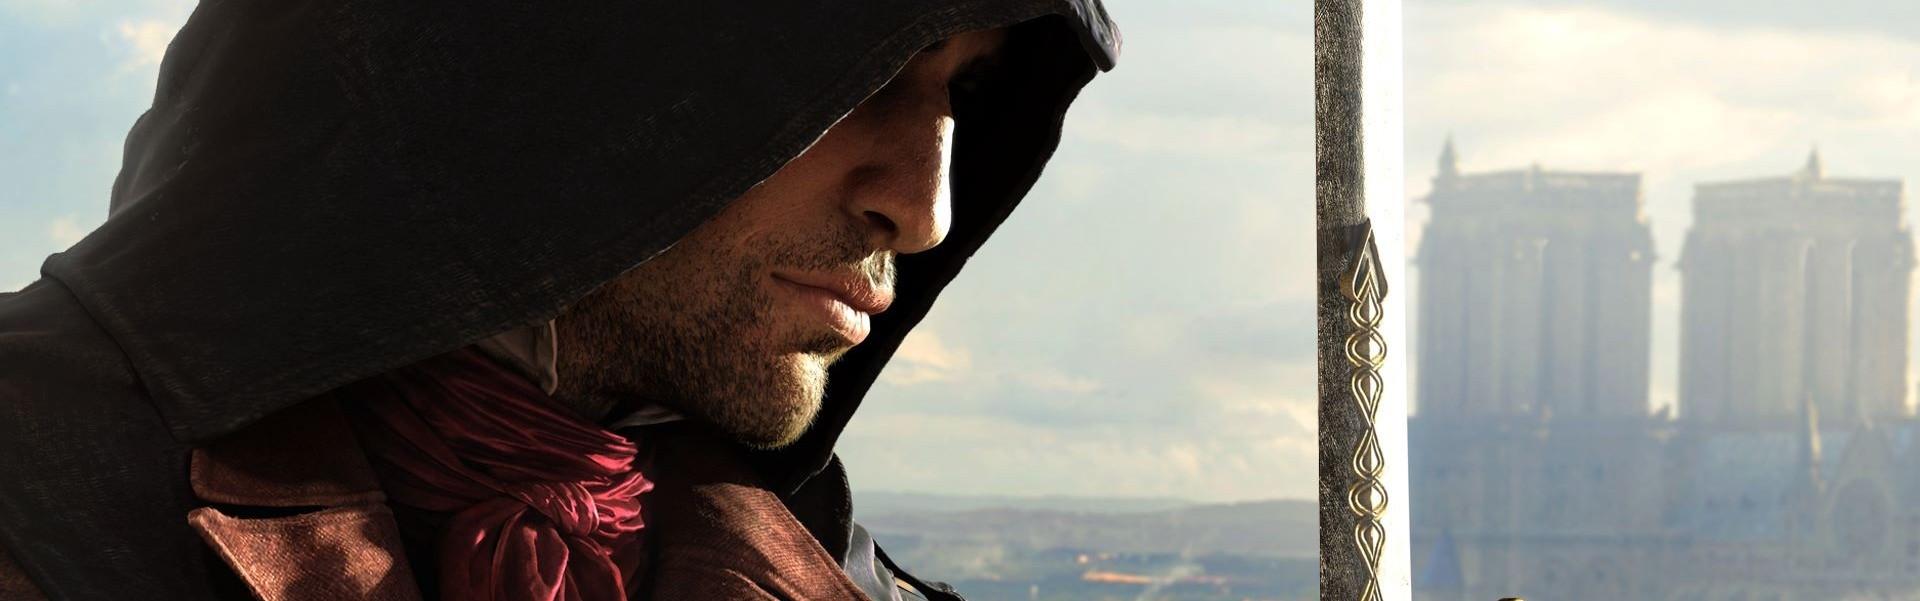 Assassin's Creed Brotherhood Uplay Key EUROPE